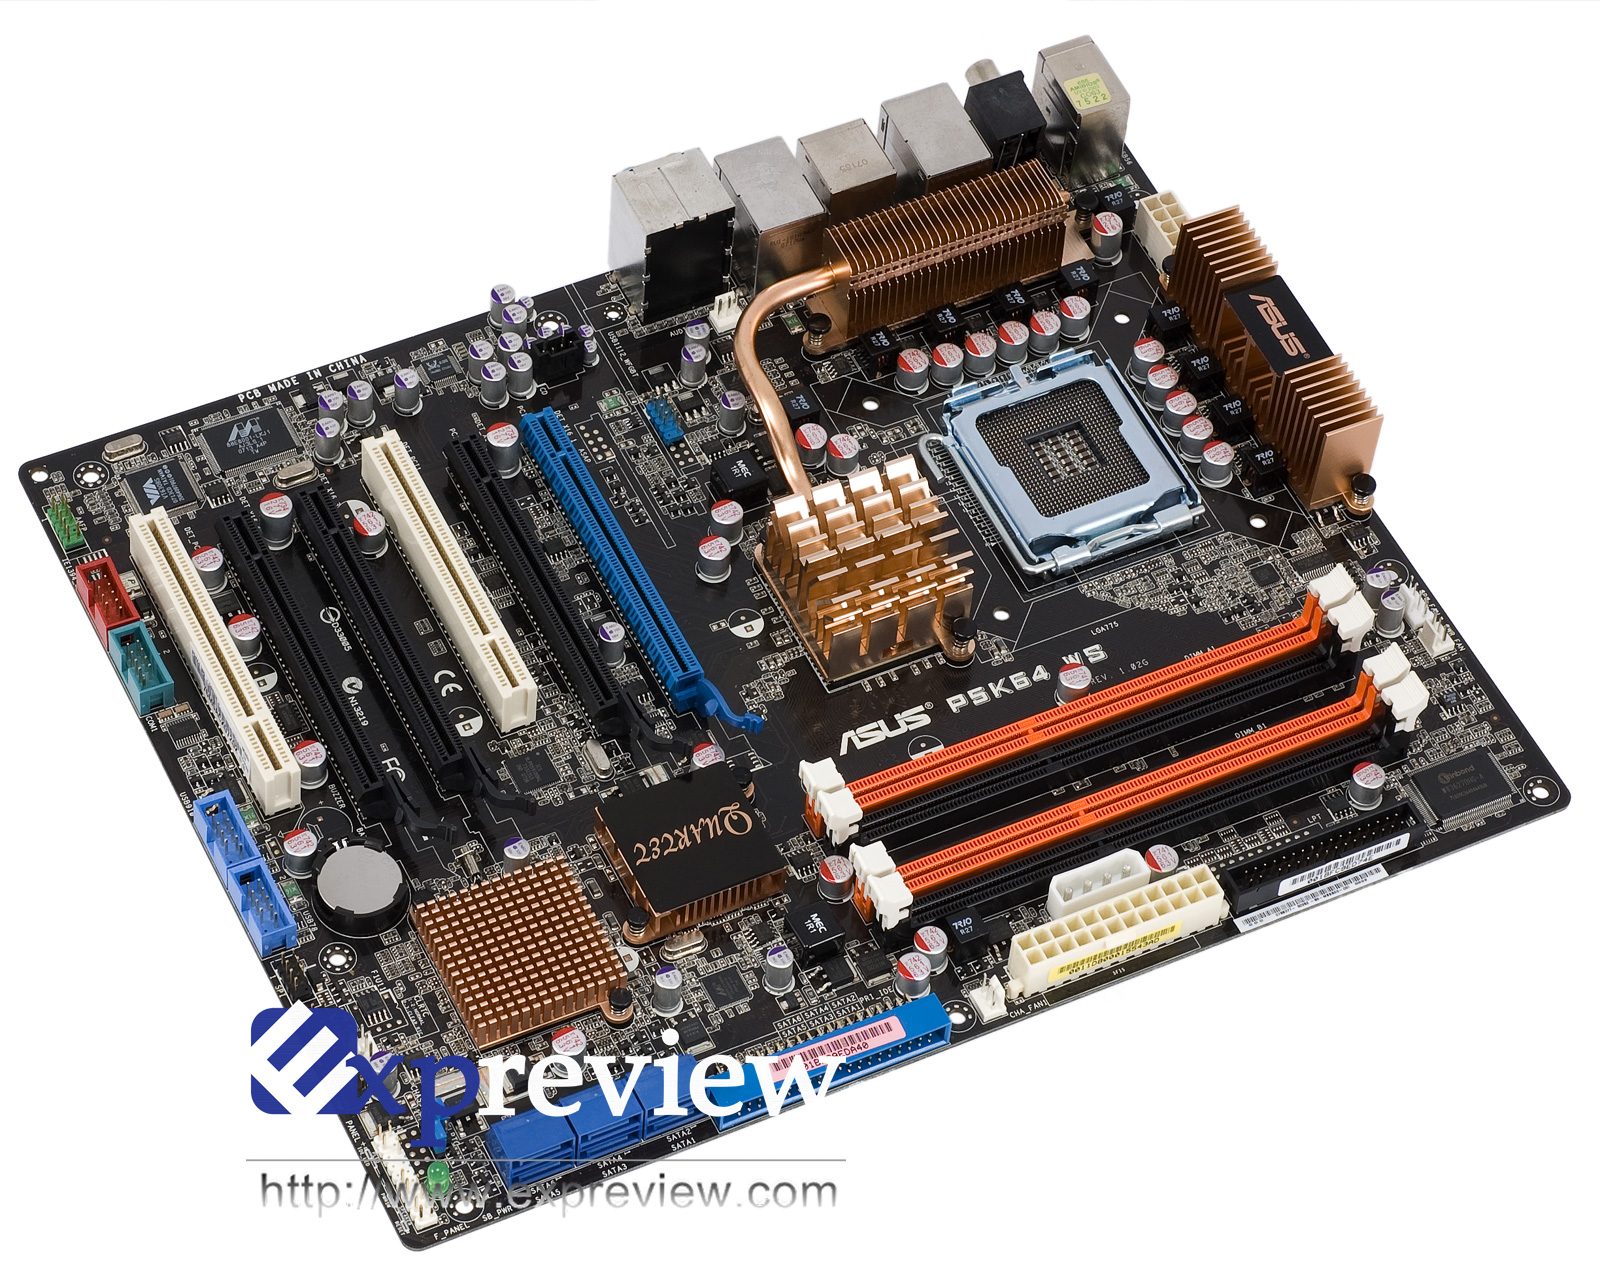 P5K64 WS的内存分频模式    Intel P35 Express是首款正式支持DDR3内存的主板芯片组,它支持的DDR3内存工作频率设定下限为DDR3-800,这意味着800/1066/1333MHz FSB的系统都无法使用1:1(FSB:DRAM)的同步分频模式。   我们在前面谈到,P5K64 WS在不同的FSB下,有不同的内存分频,它把200MHz~800MHz的外频范围分成200~239/240~265/266~292/293~319/320~332/333~399/400~655/656